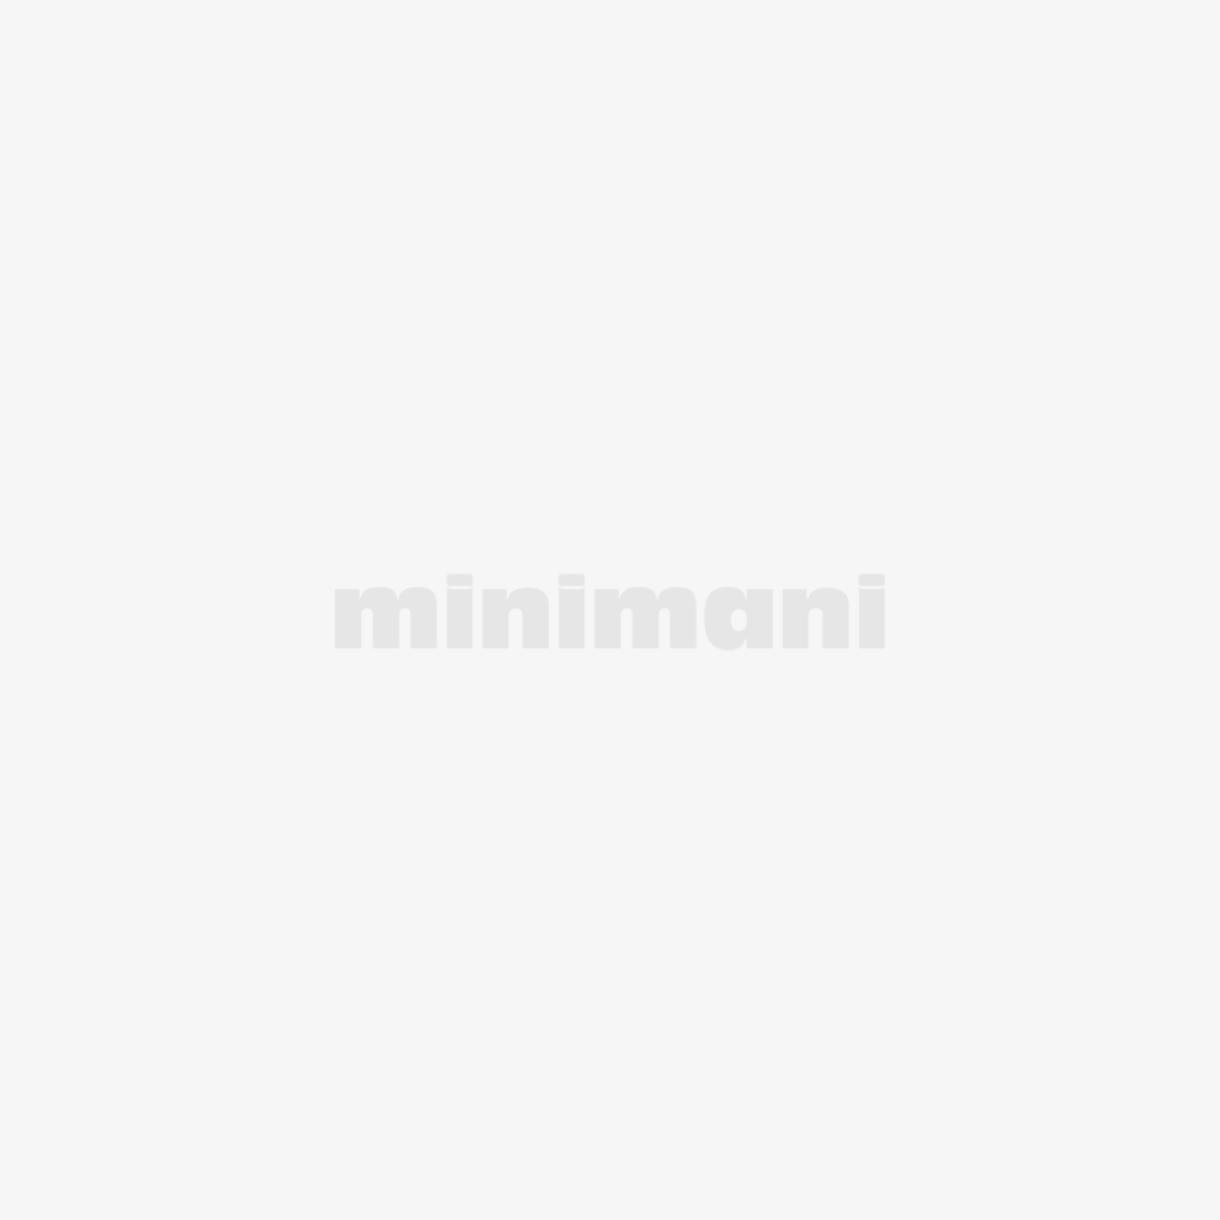 Vallila verhokappa 60x250cm, Elle musta/harmaa